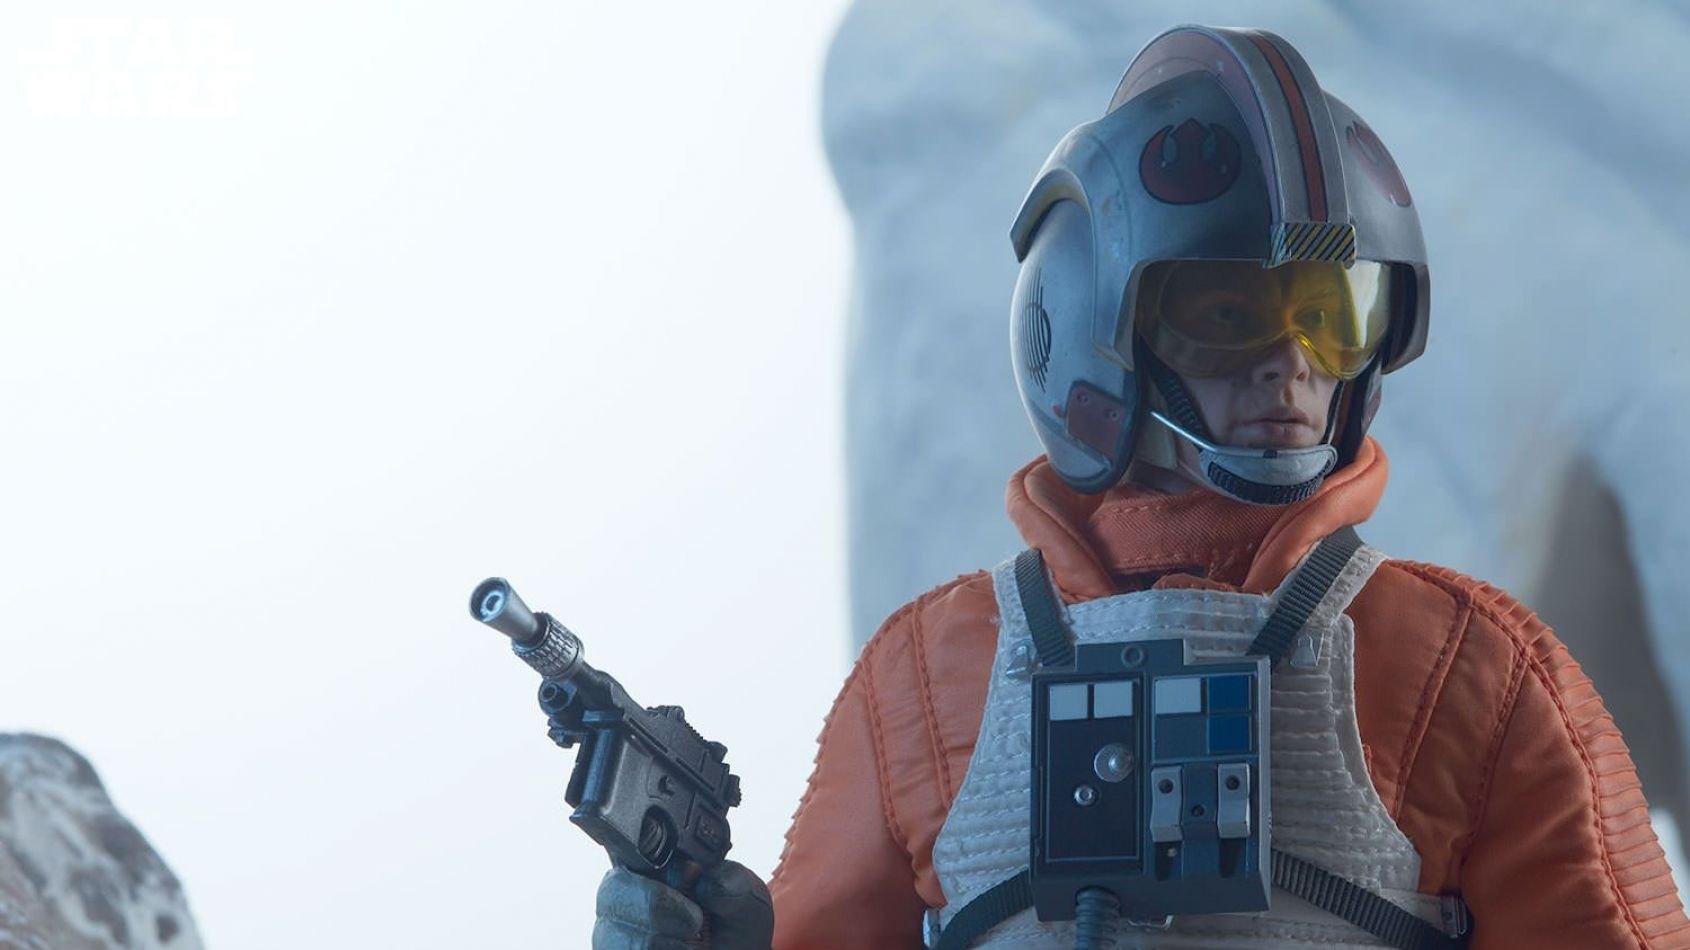 Sideshow : Luke Skywalker en version pilote de snowspeeder